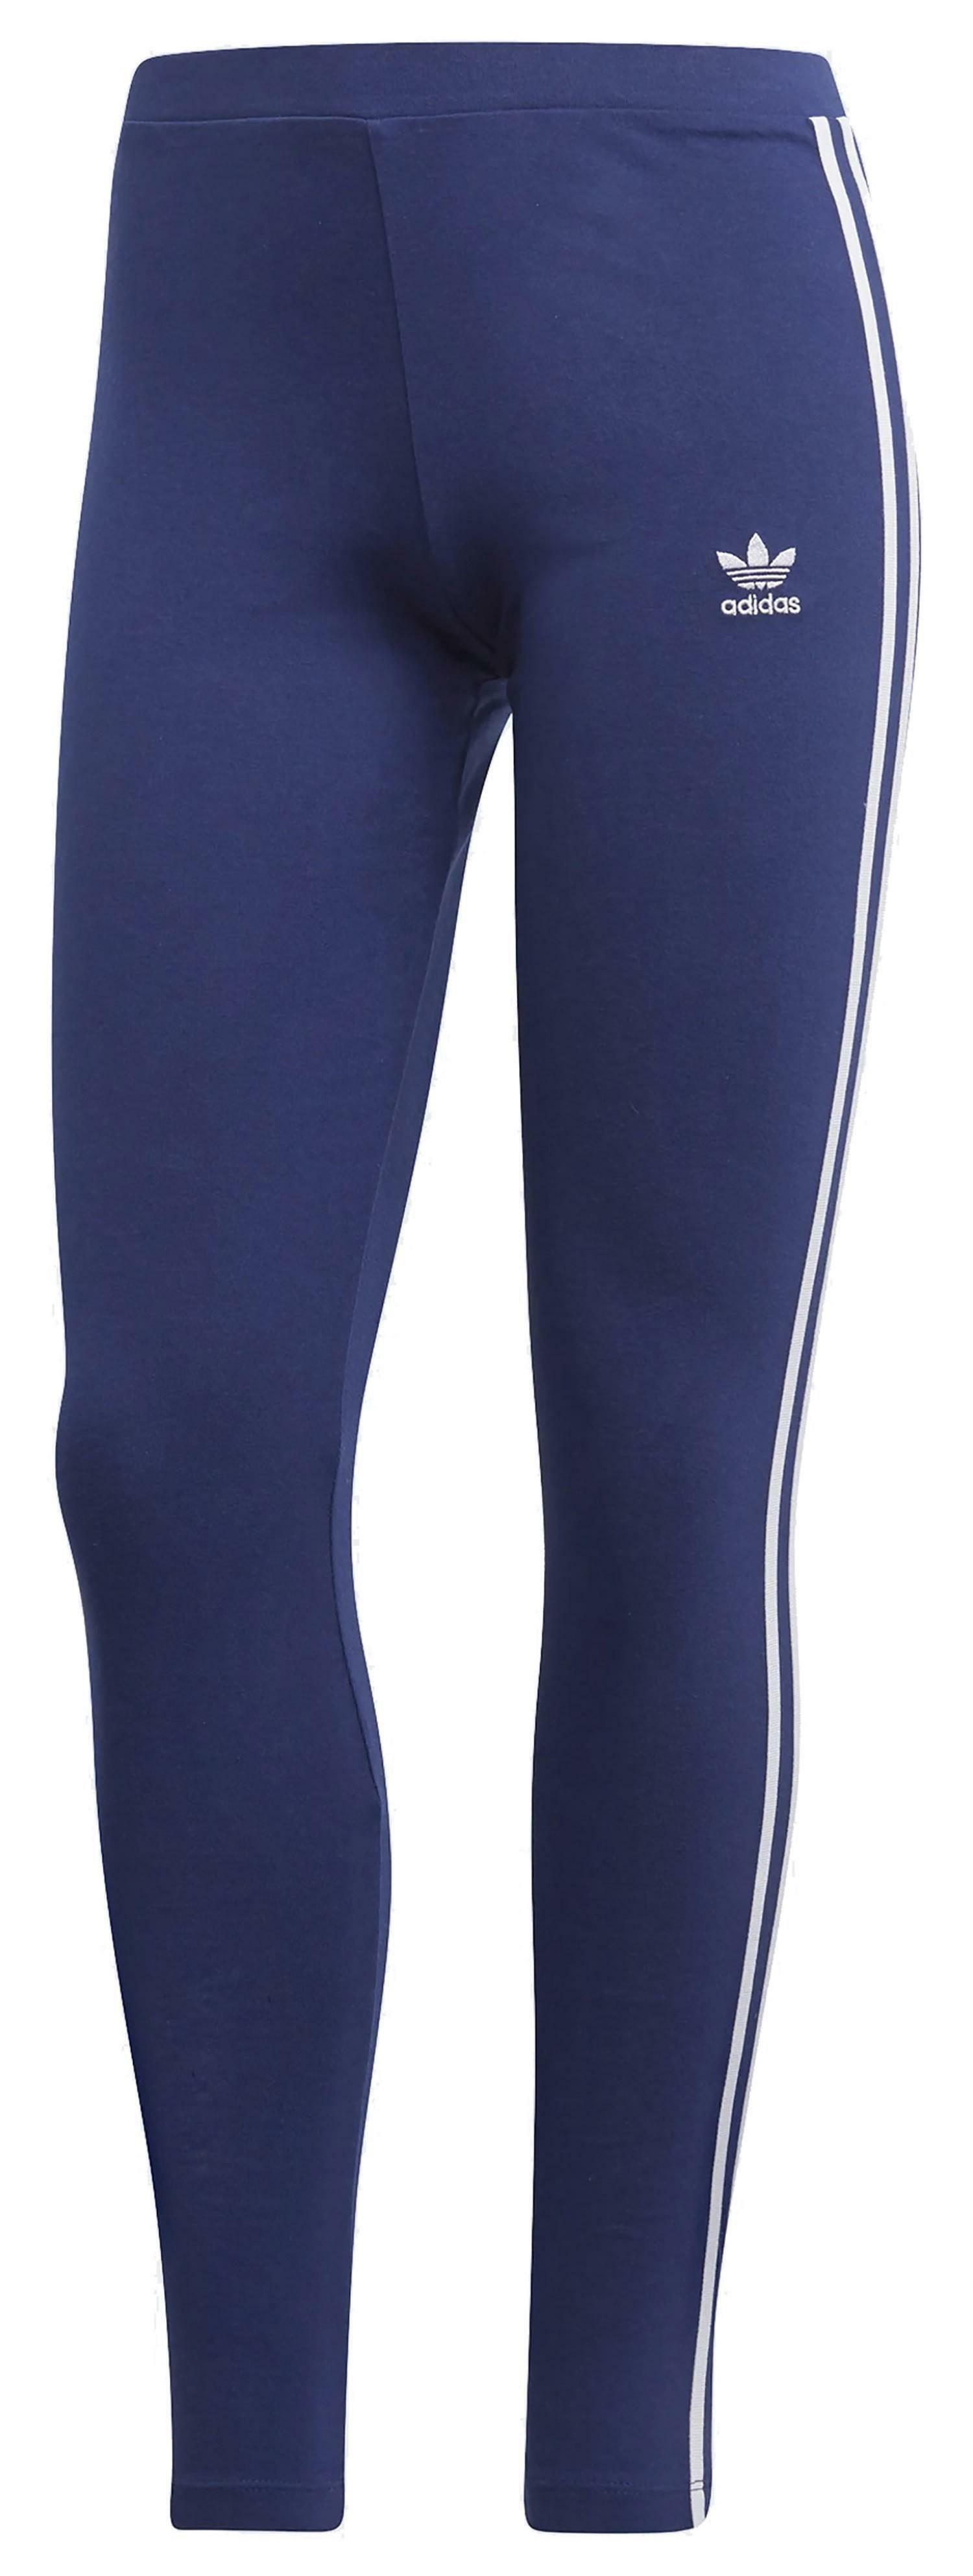 adidas 3 str tight leggings donna blu dv2615